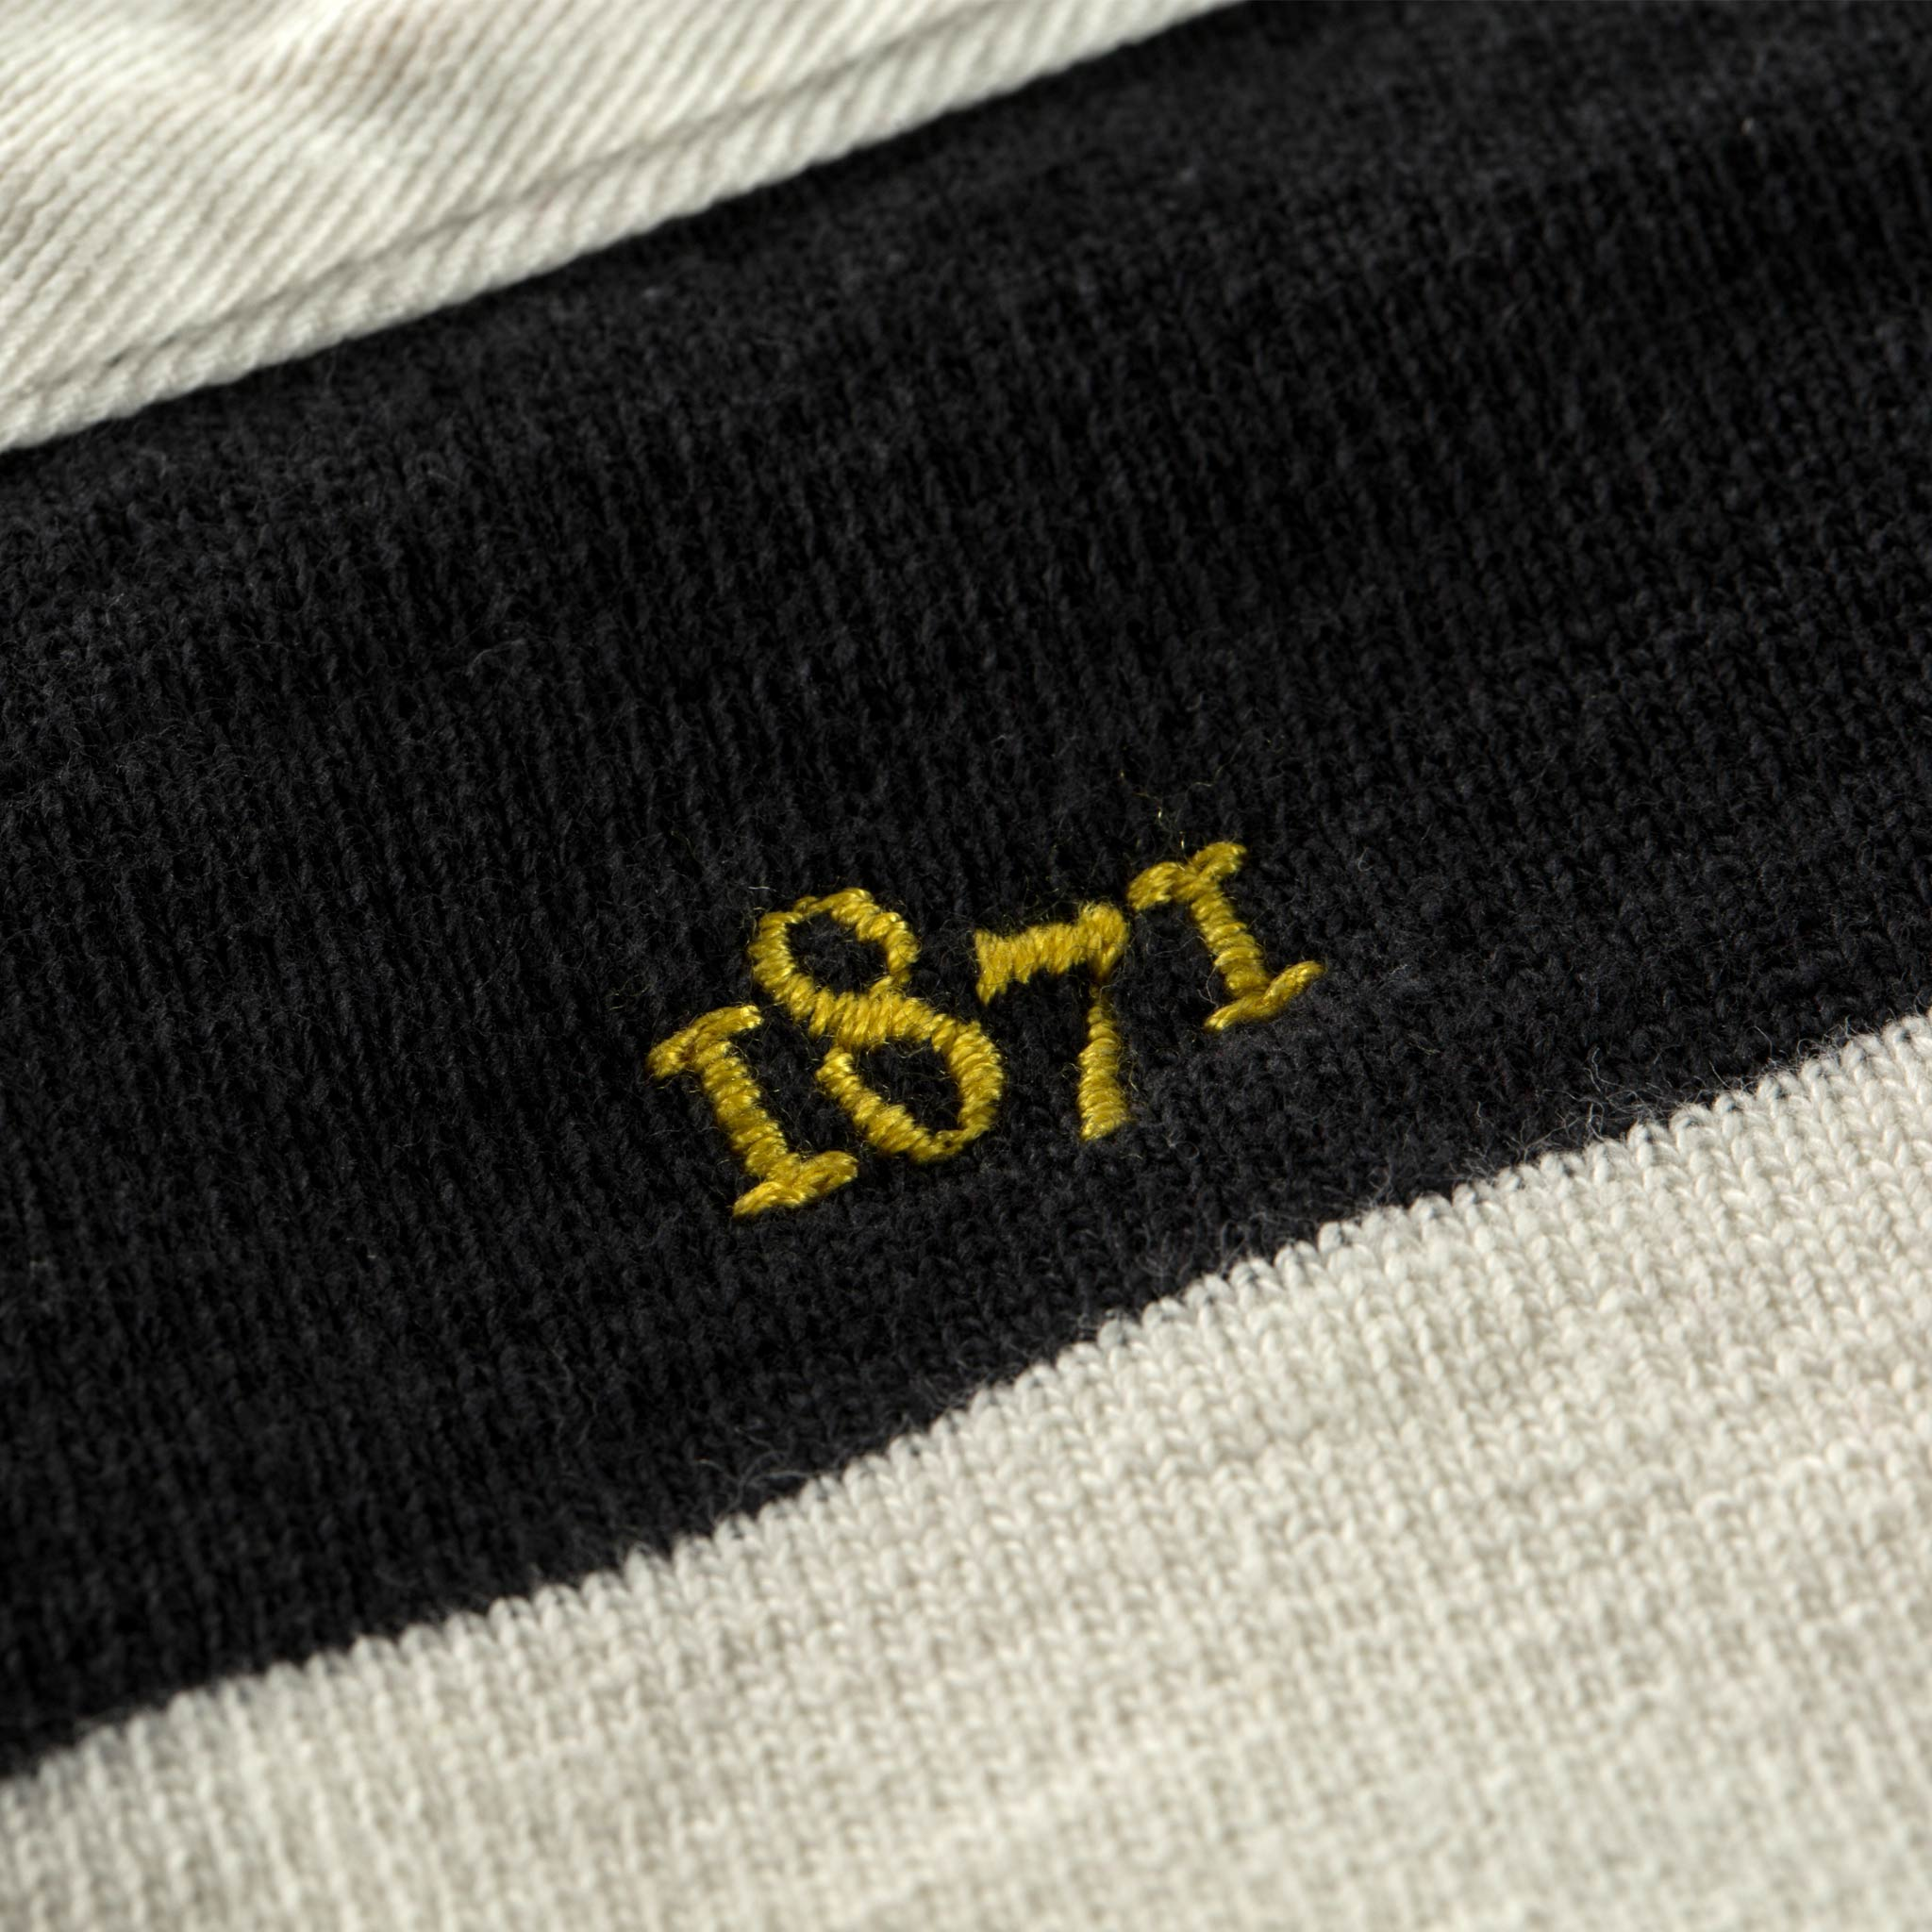 Wimbledon Hornets 1871 embroidery